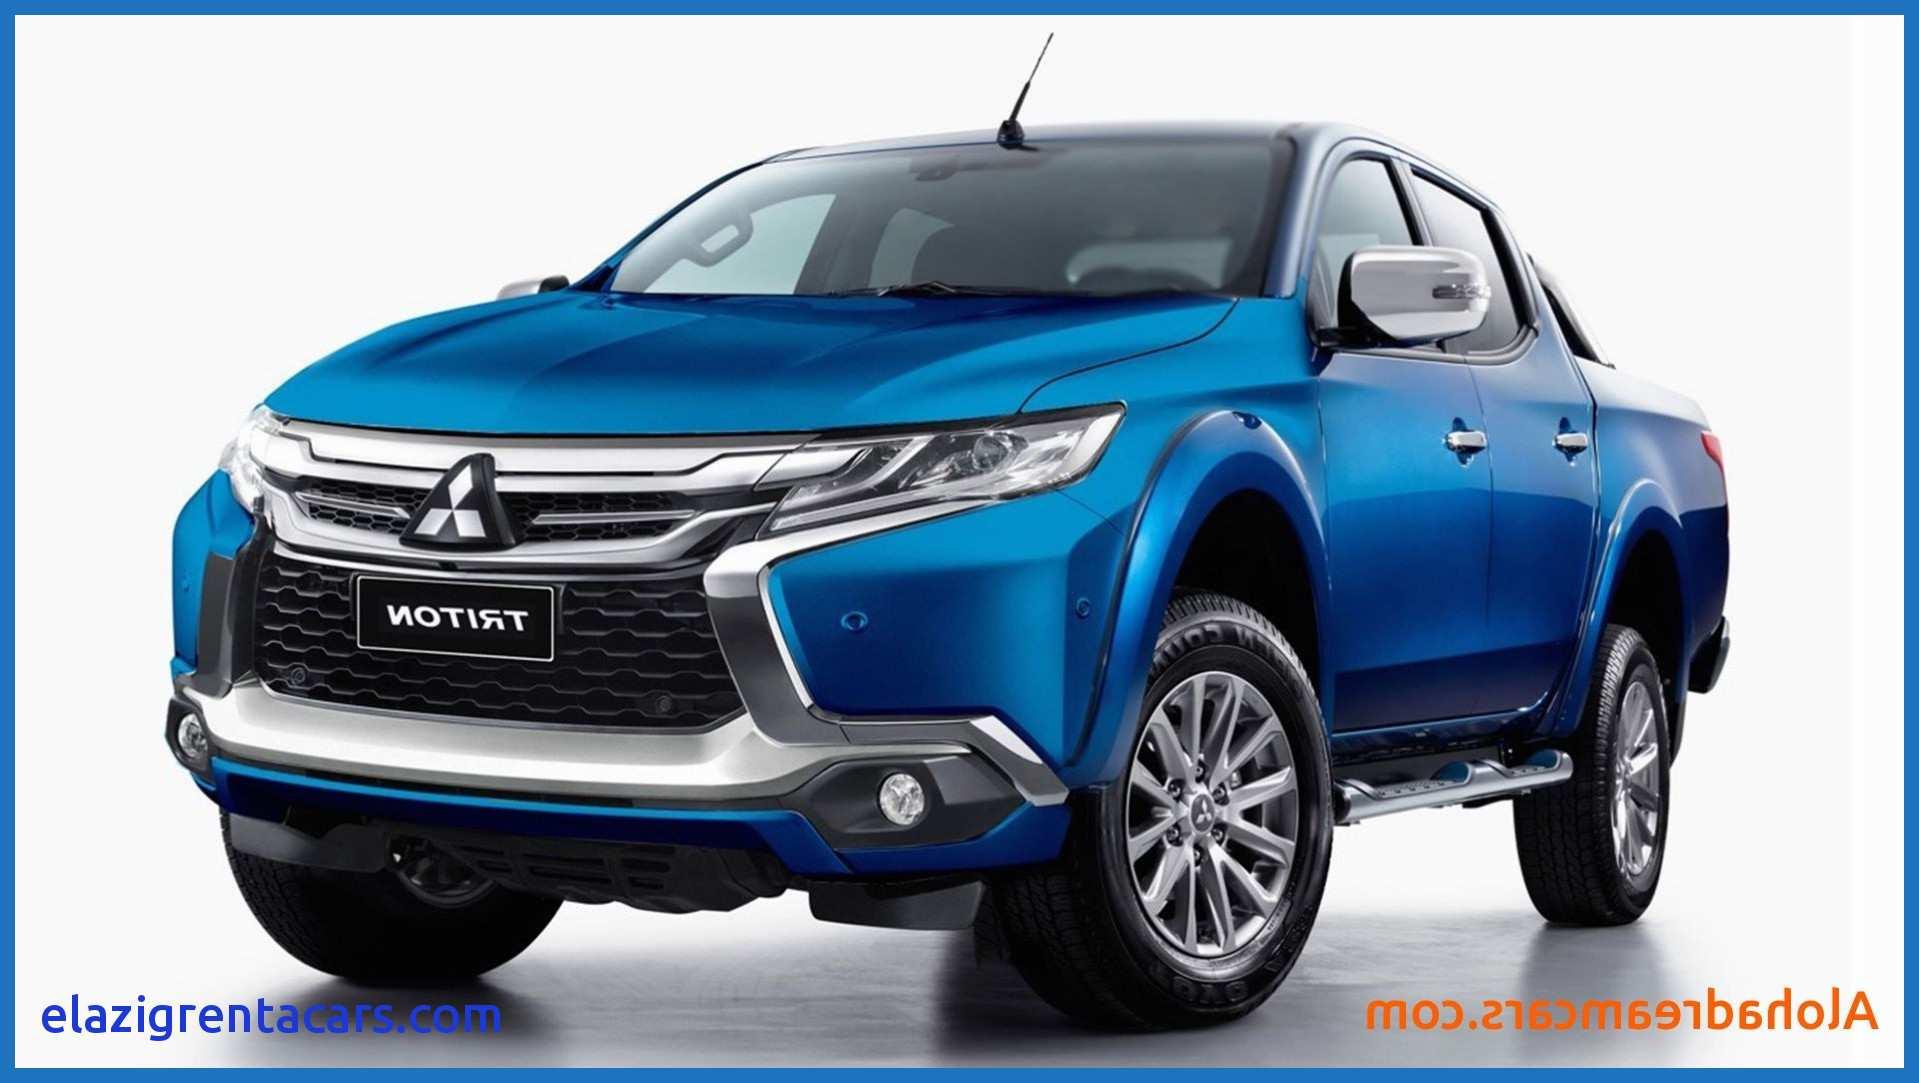 58 The 2020 Mitsubishi L200 2018 Overview for 2020 Mitsubishi L200 2018